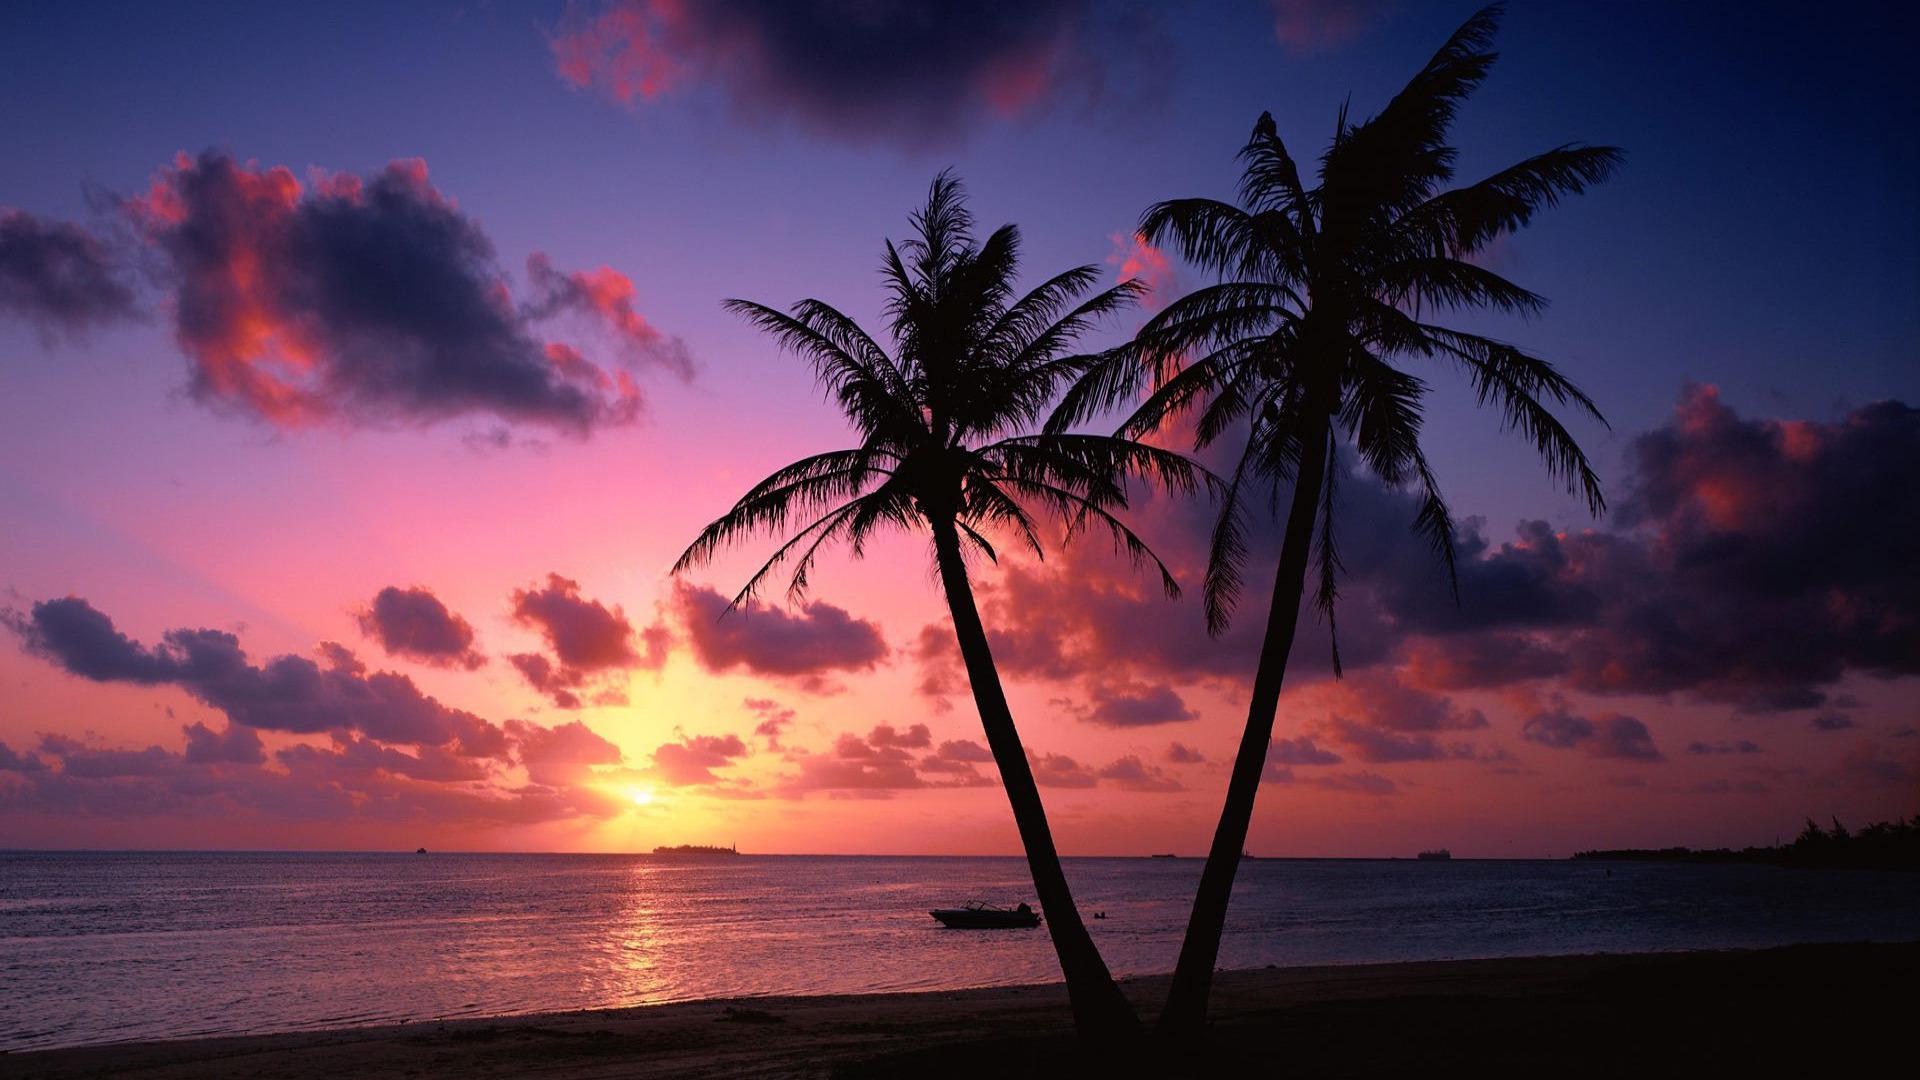 tropical island sunset wallpaper wallpapersafari. Black Bedroom Furniture Sets. Home Design Ideas